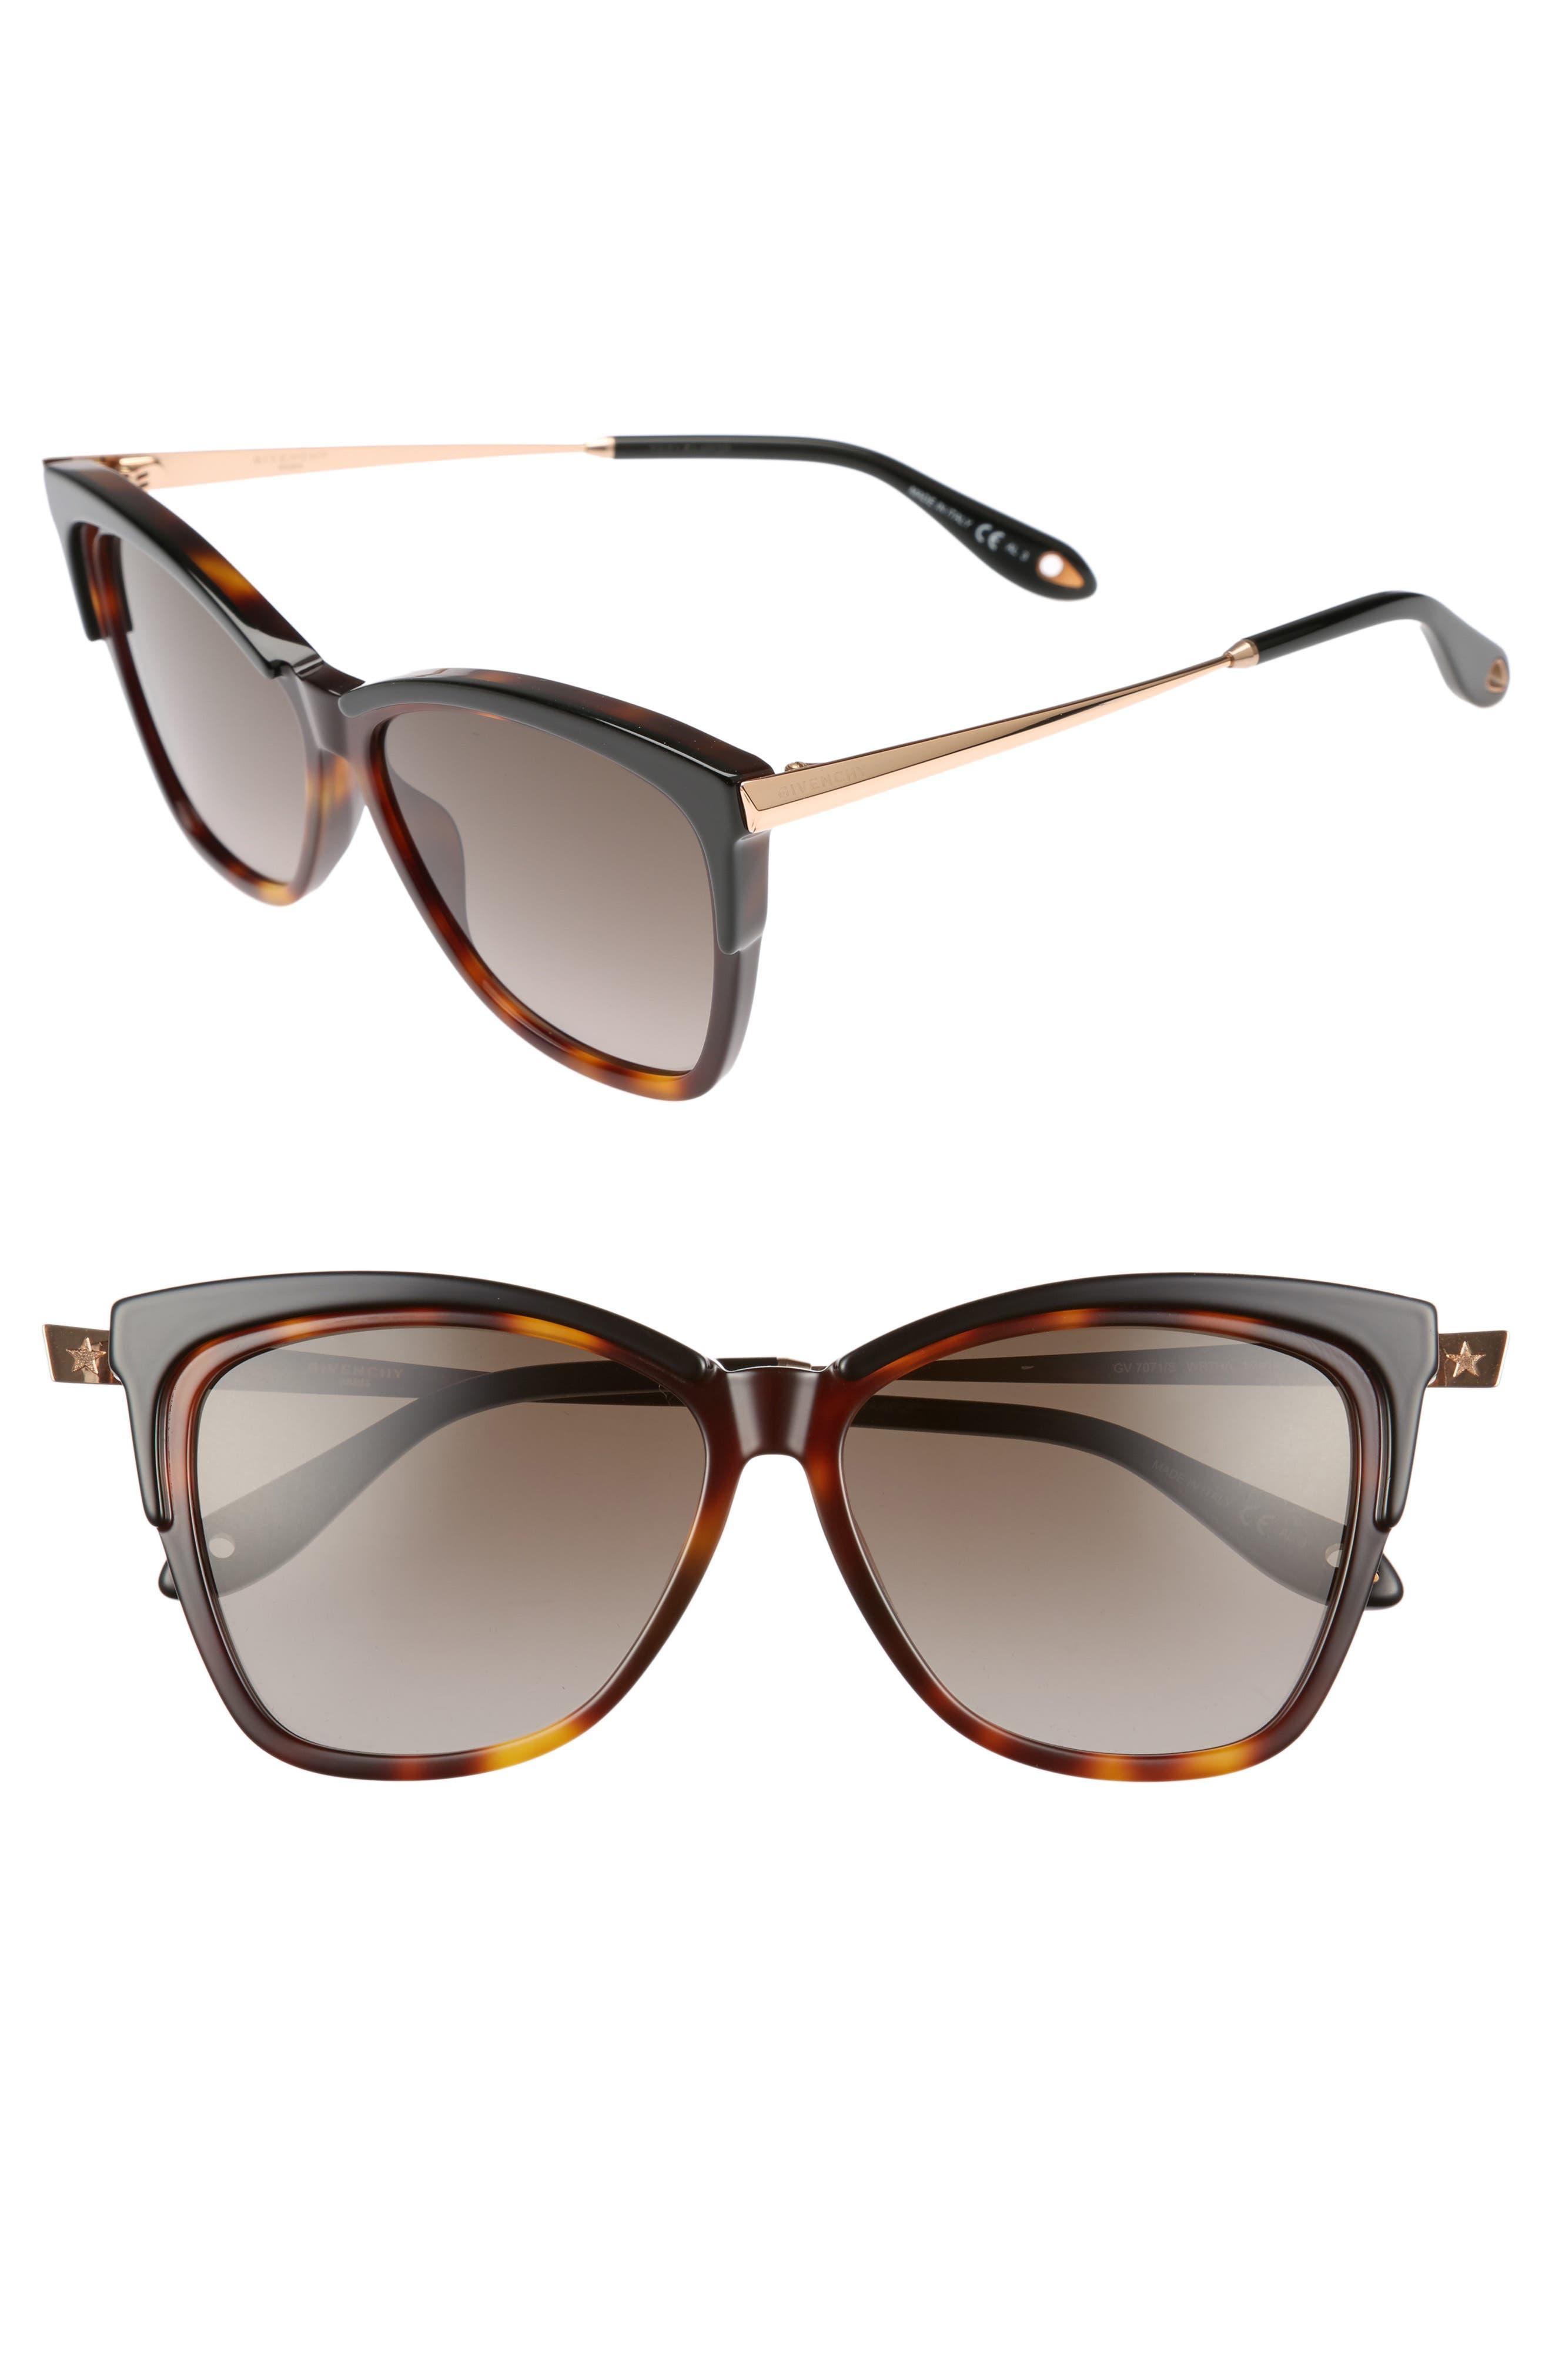 57mm Cat Eye Sunglasses,                             Main thumbnail 1, color,                             DARK HAVANA